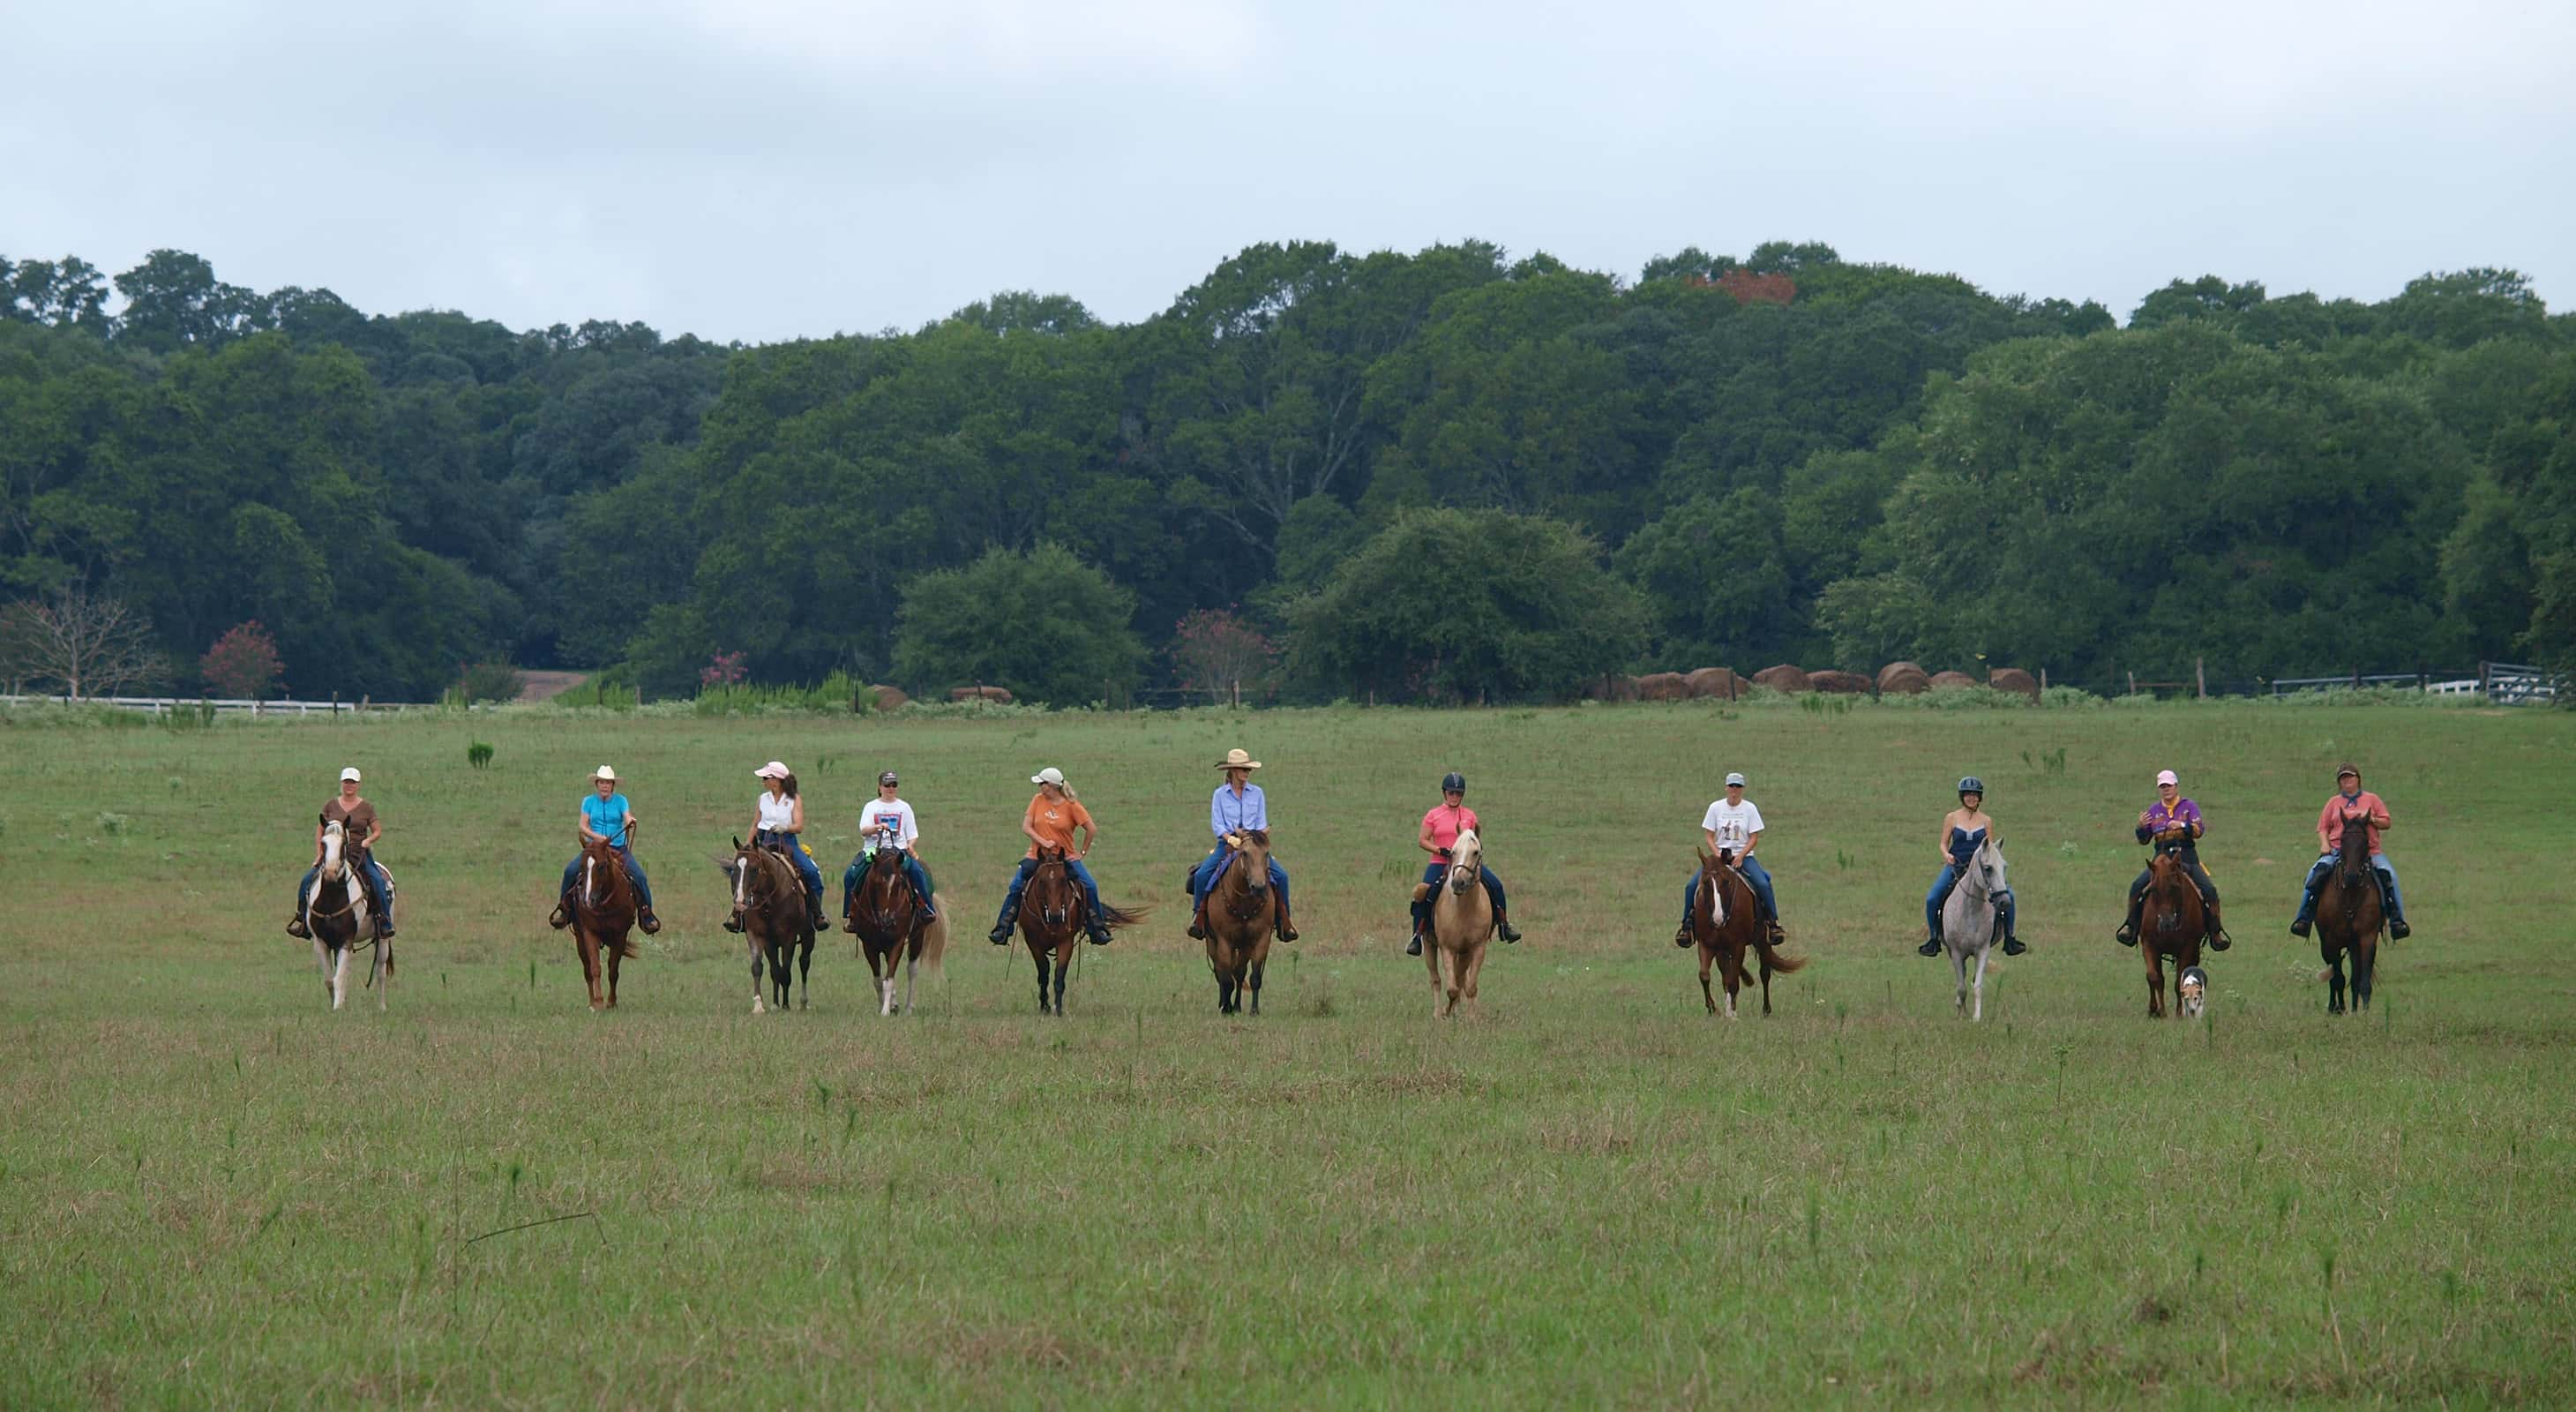 horseback ride on corporate retreats near Houston